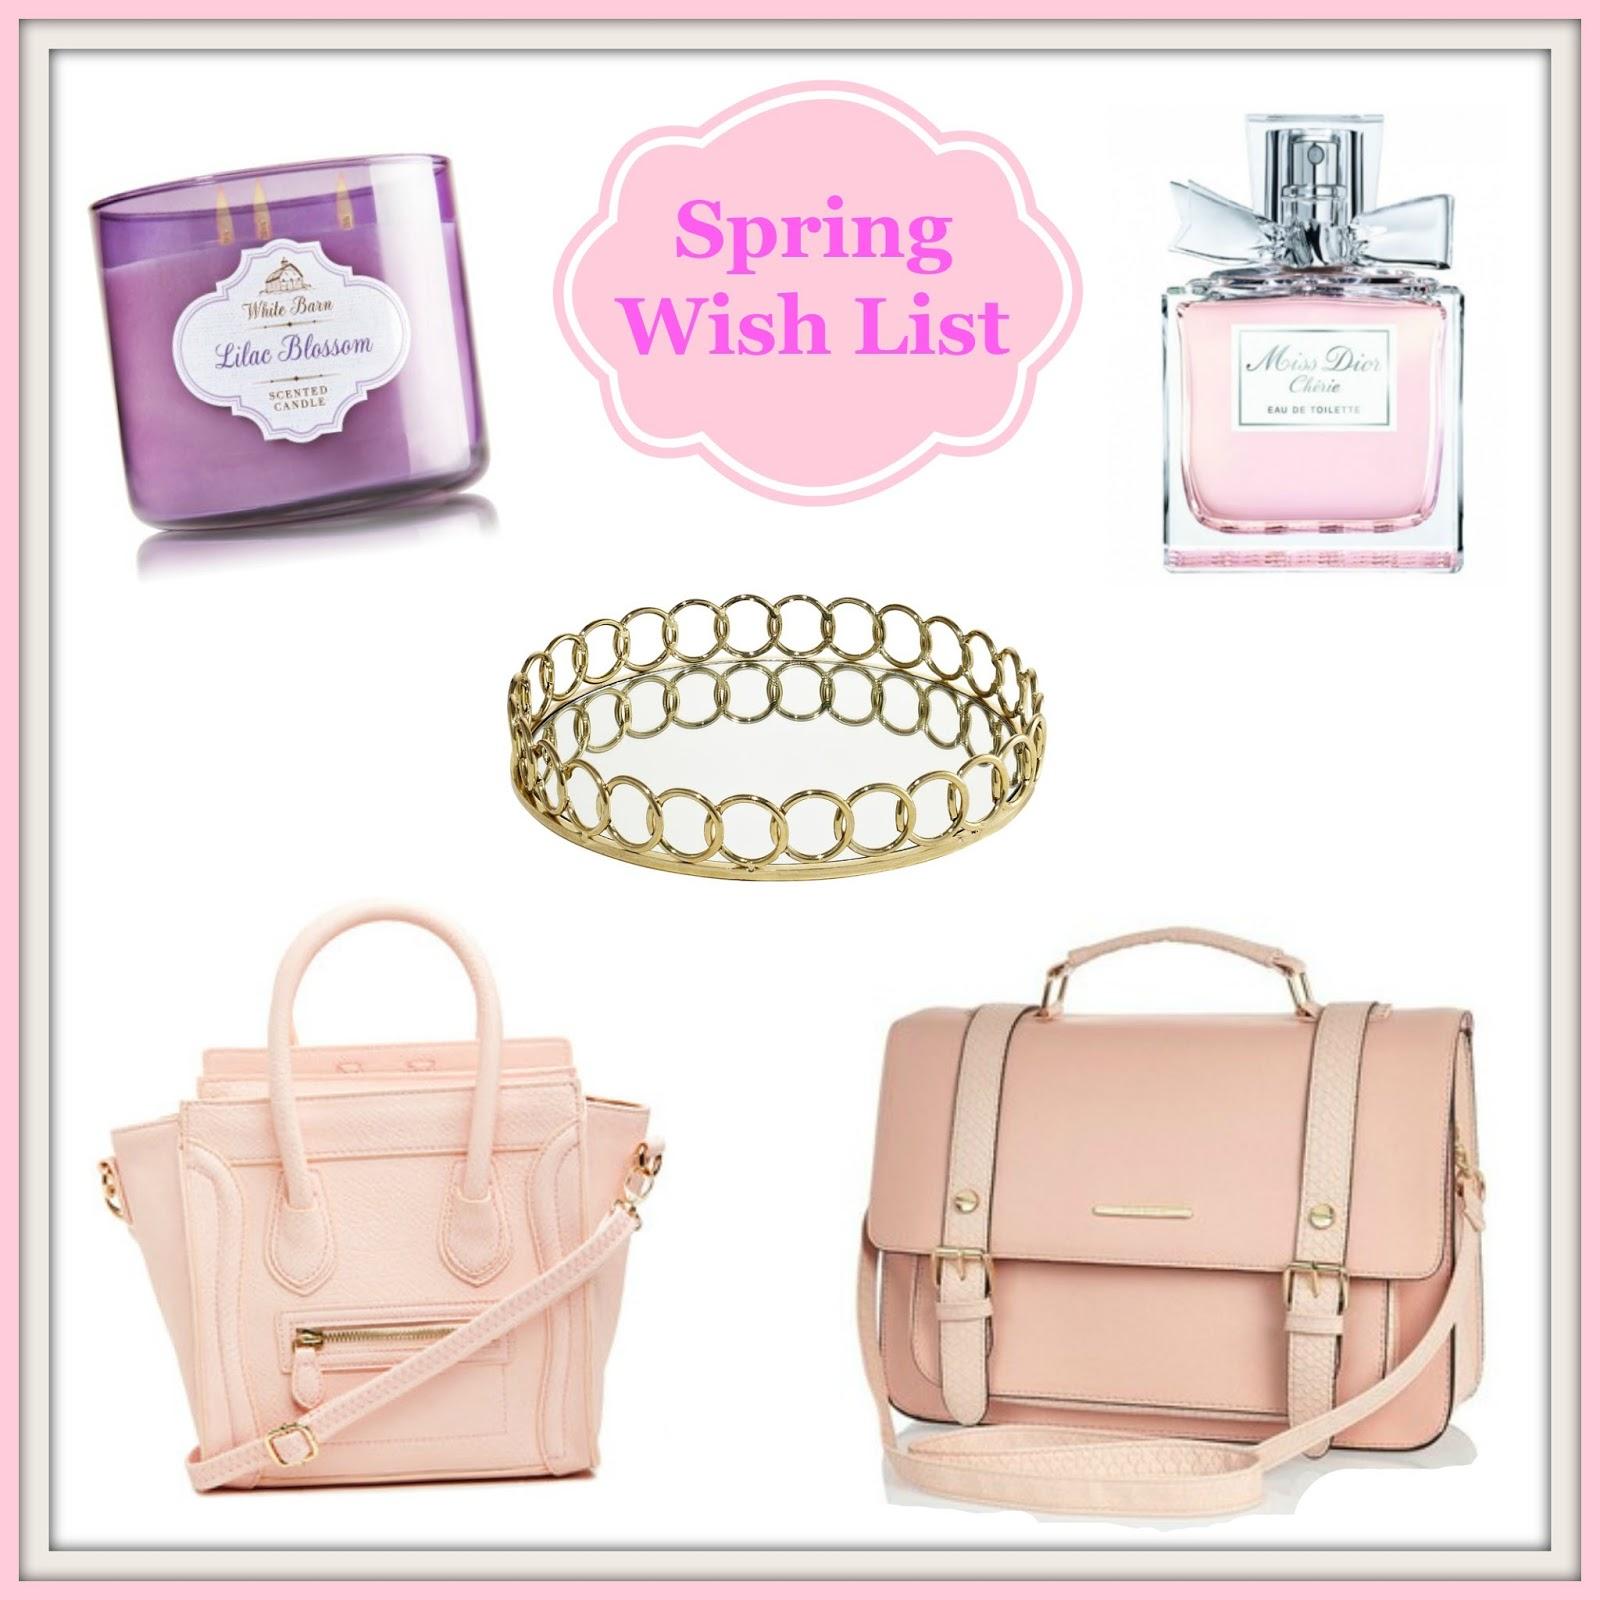 Bath & Body Works Lilac Blossom, Miss Dior Perfume, Gold Perfume Tray, Dailylook Mini Structured Pink Handbag, River Island Satchel